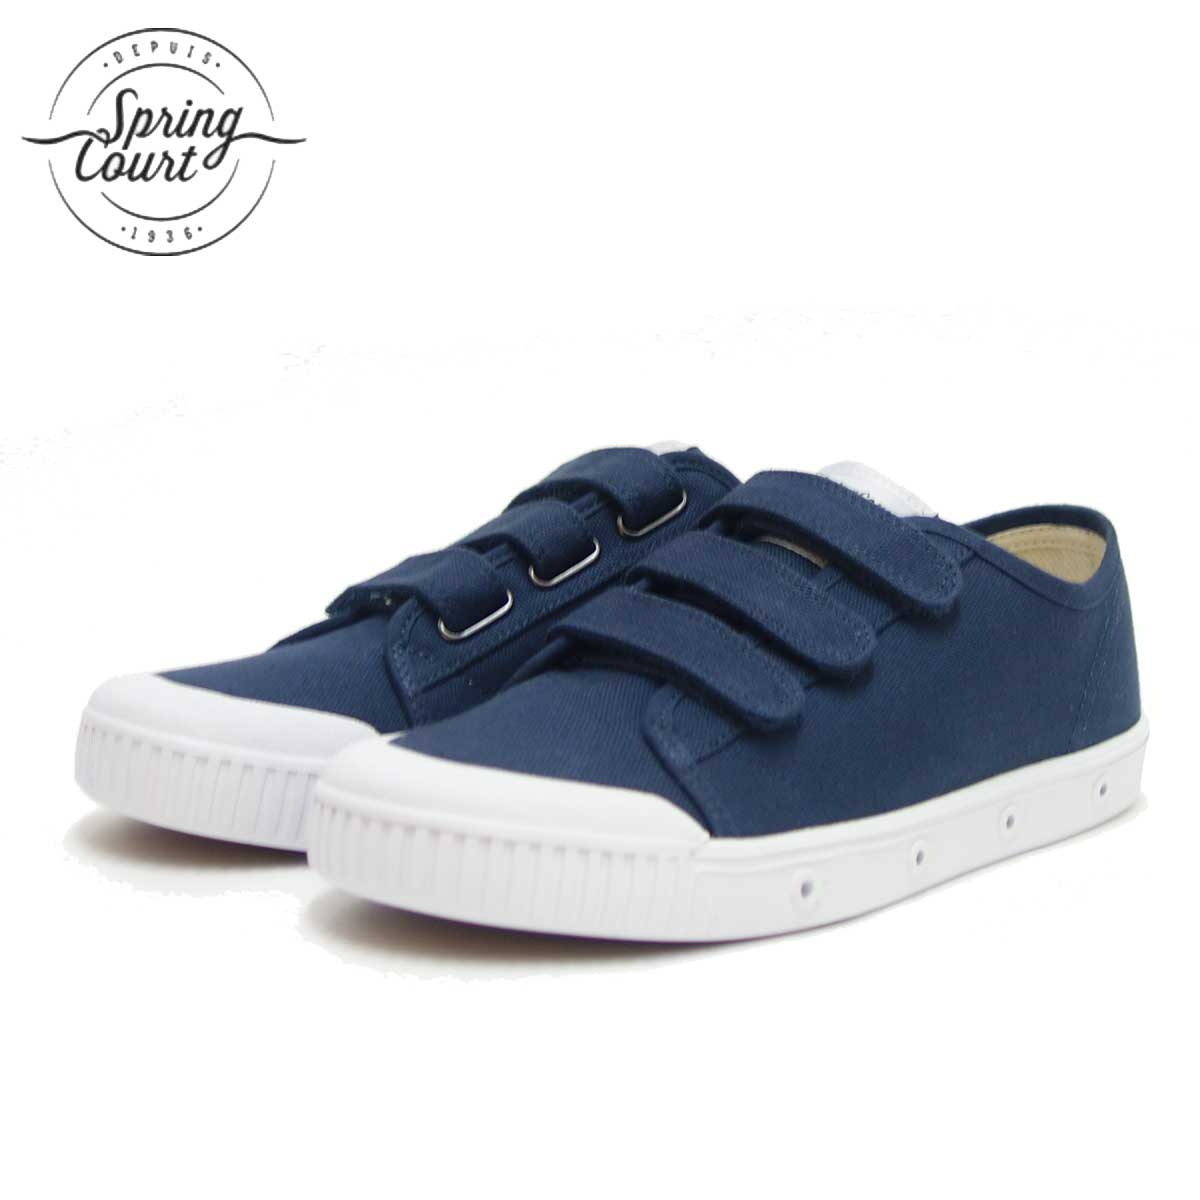 Spring Court スプリングコート G2SV-V1(レディース)VELCRO CANVAS MIDNIGHT BLUE キャンバス地のベルクロスニーカー 「靴」